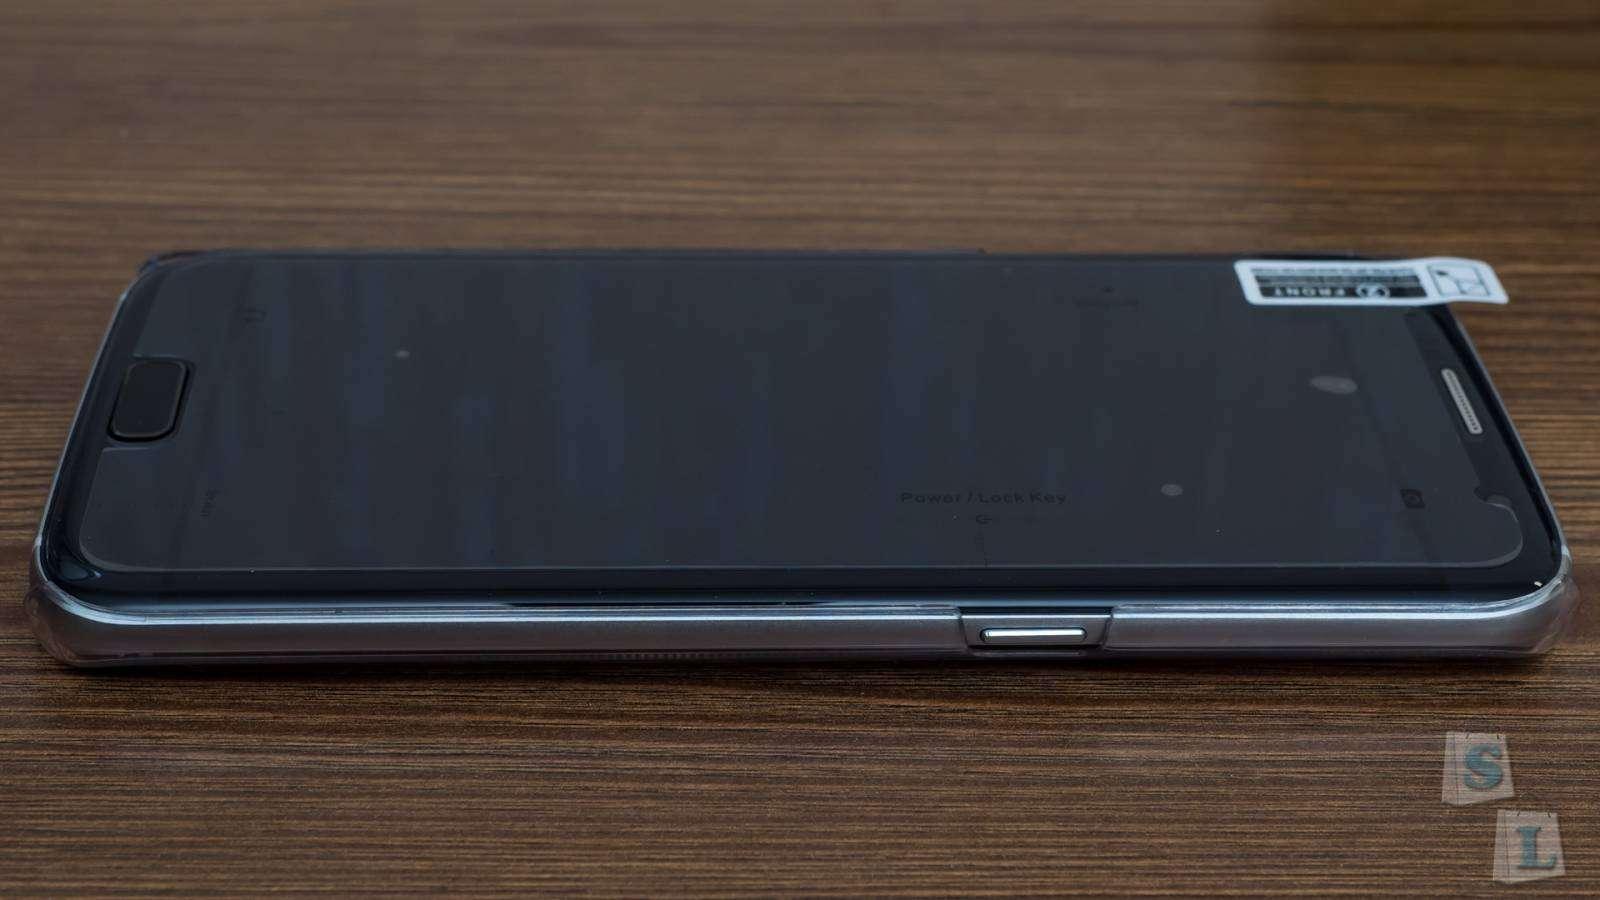 GearBest: Обзор смартфона Bluboo Edge - отчет о призе по акции Gearbest как Дед Мороз